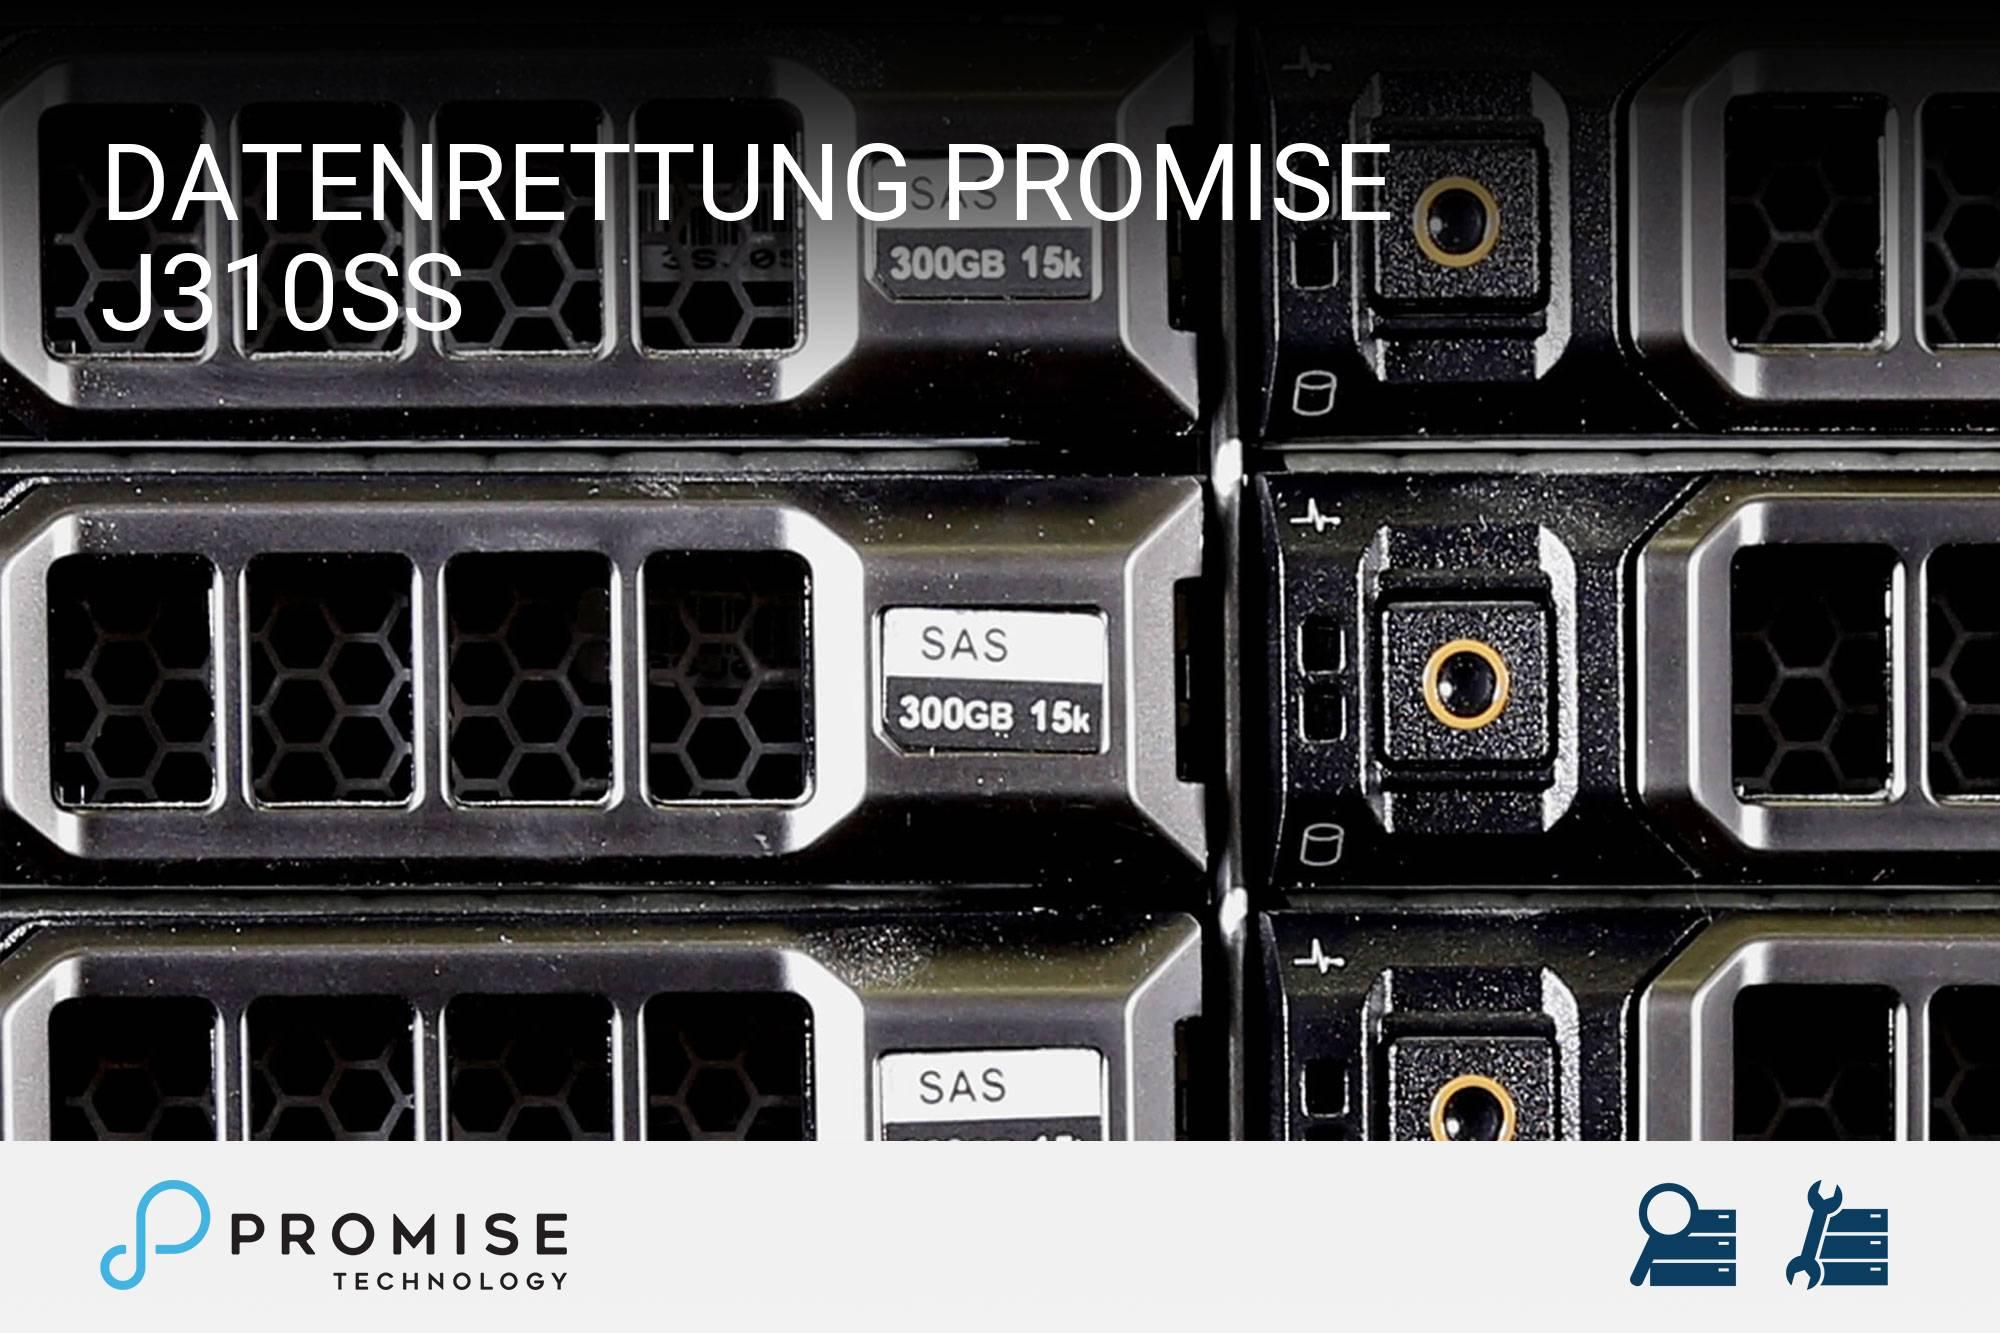 Promise J310sS